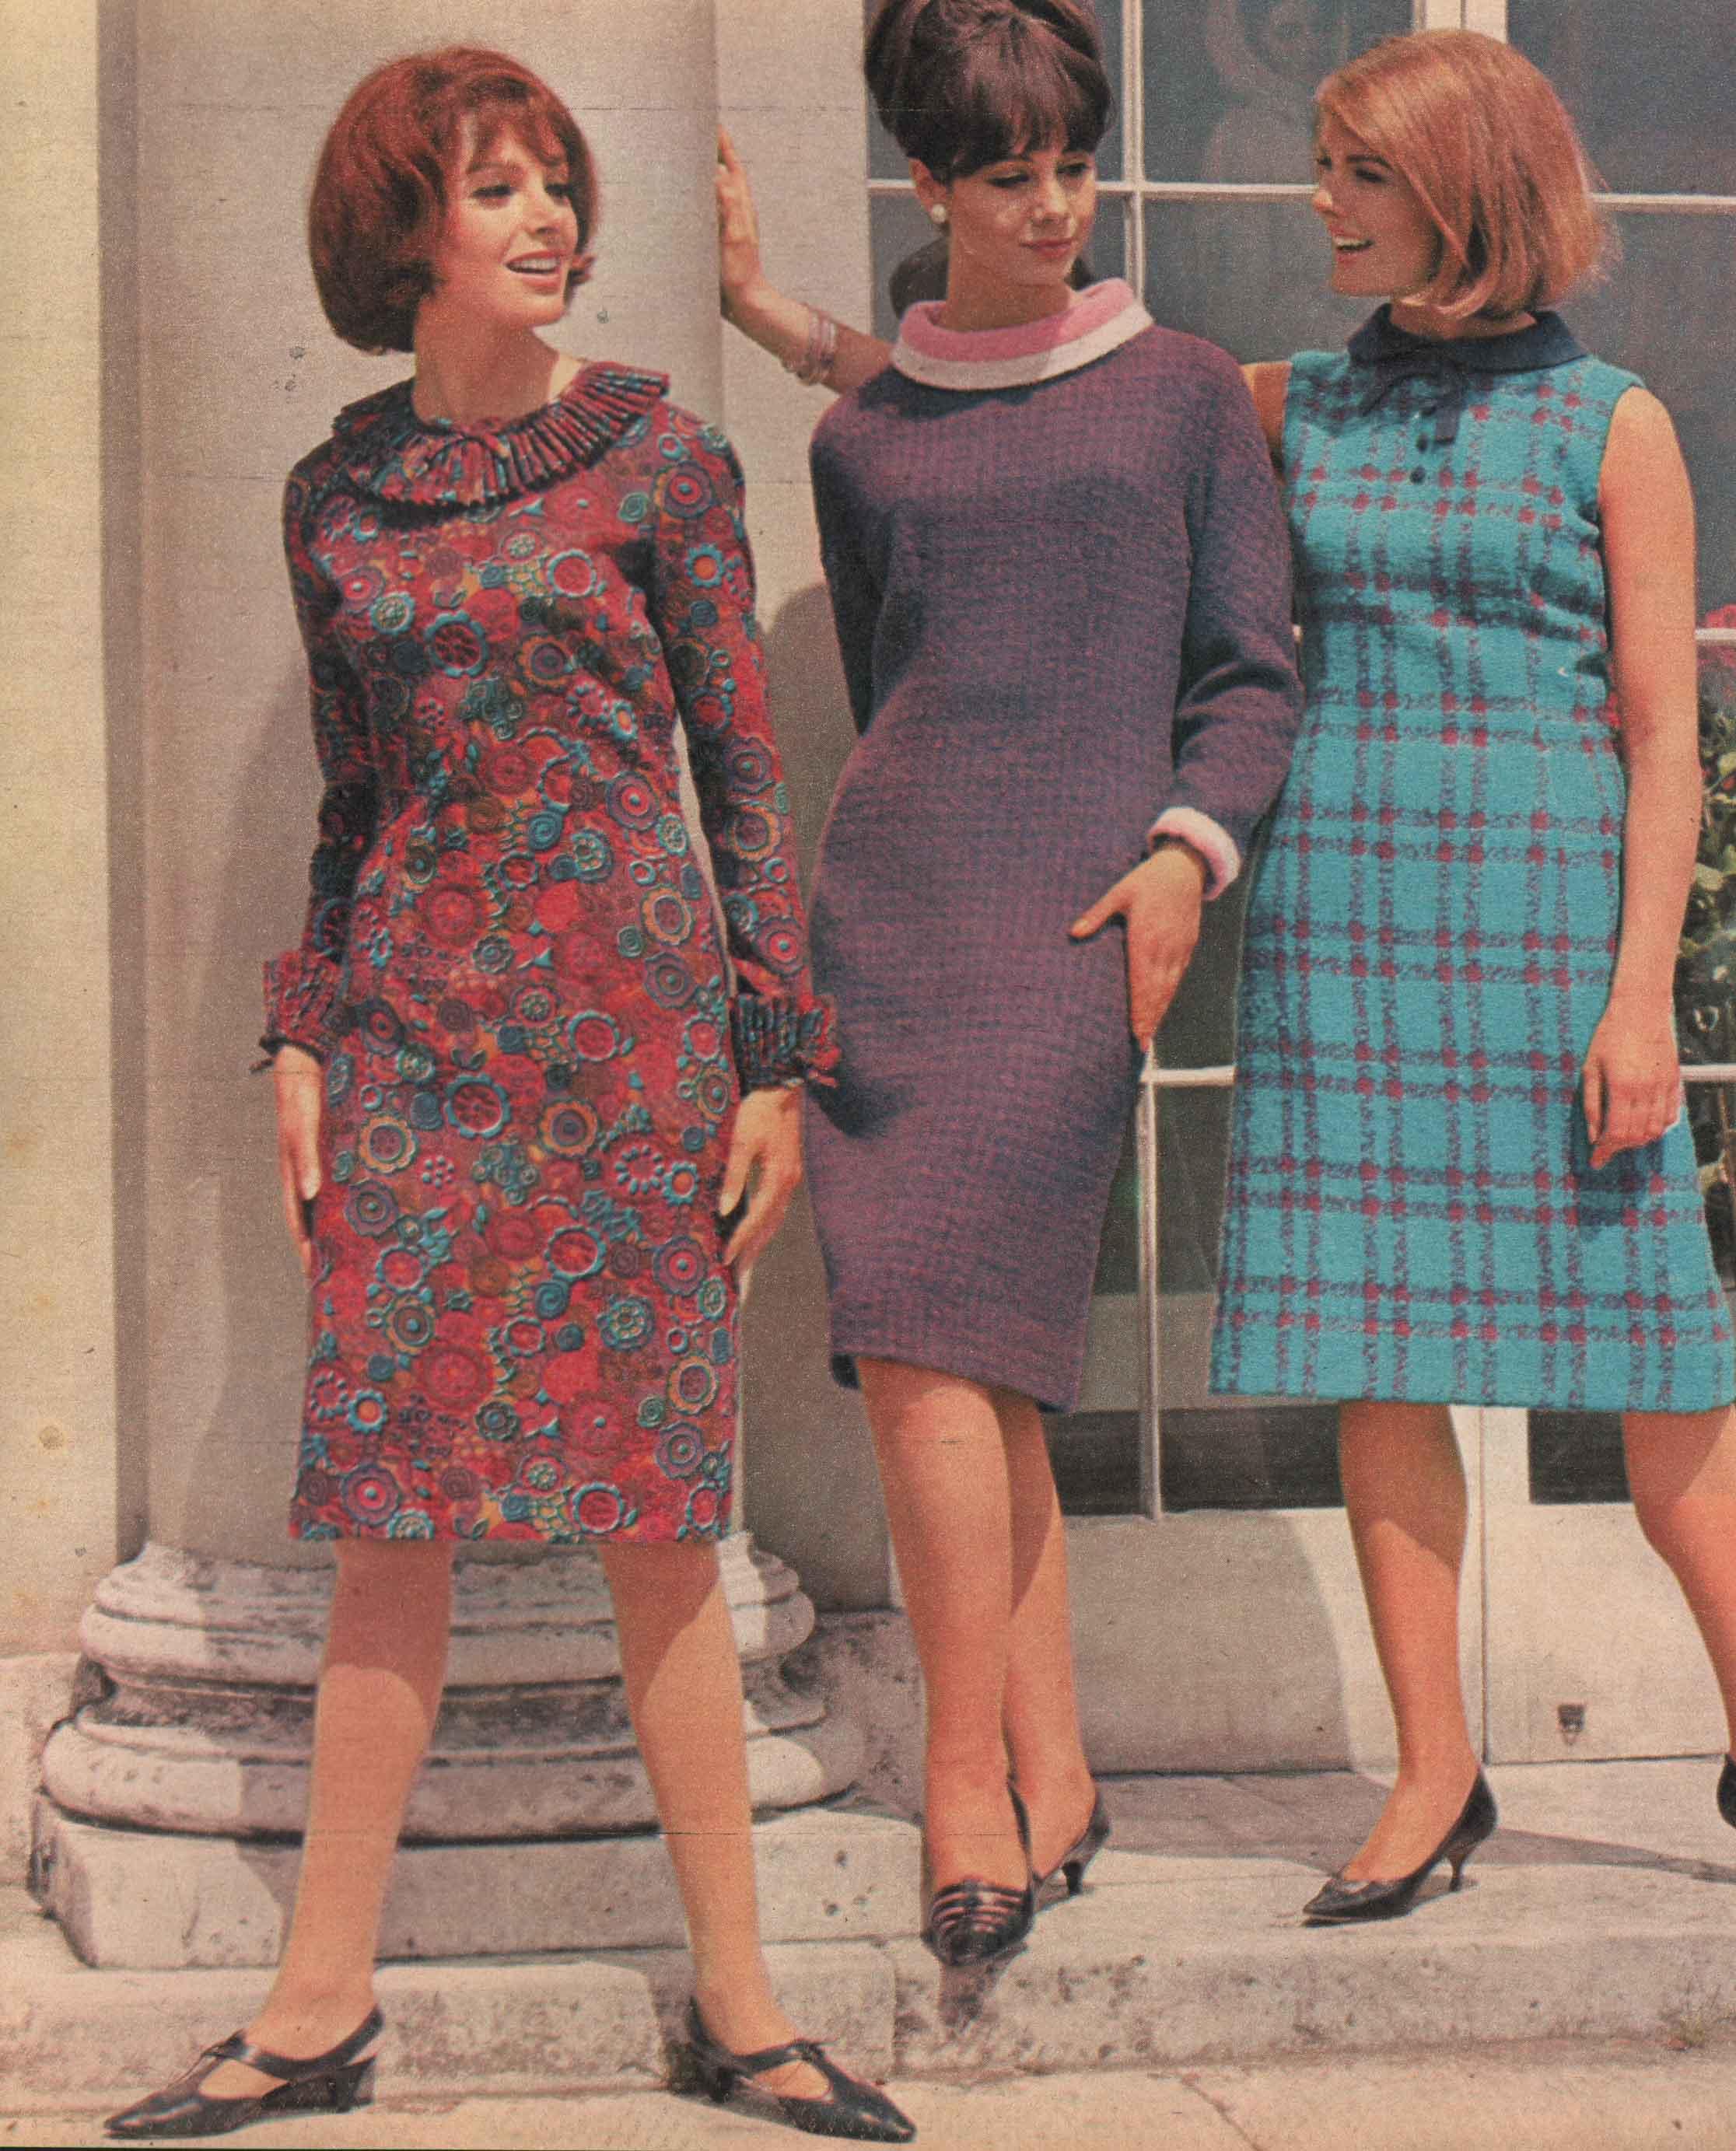 Fashion week 1960 Early fashion for girls